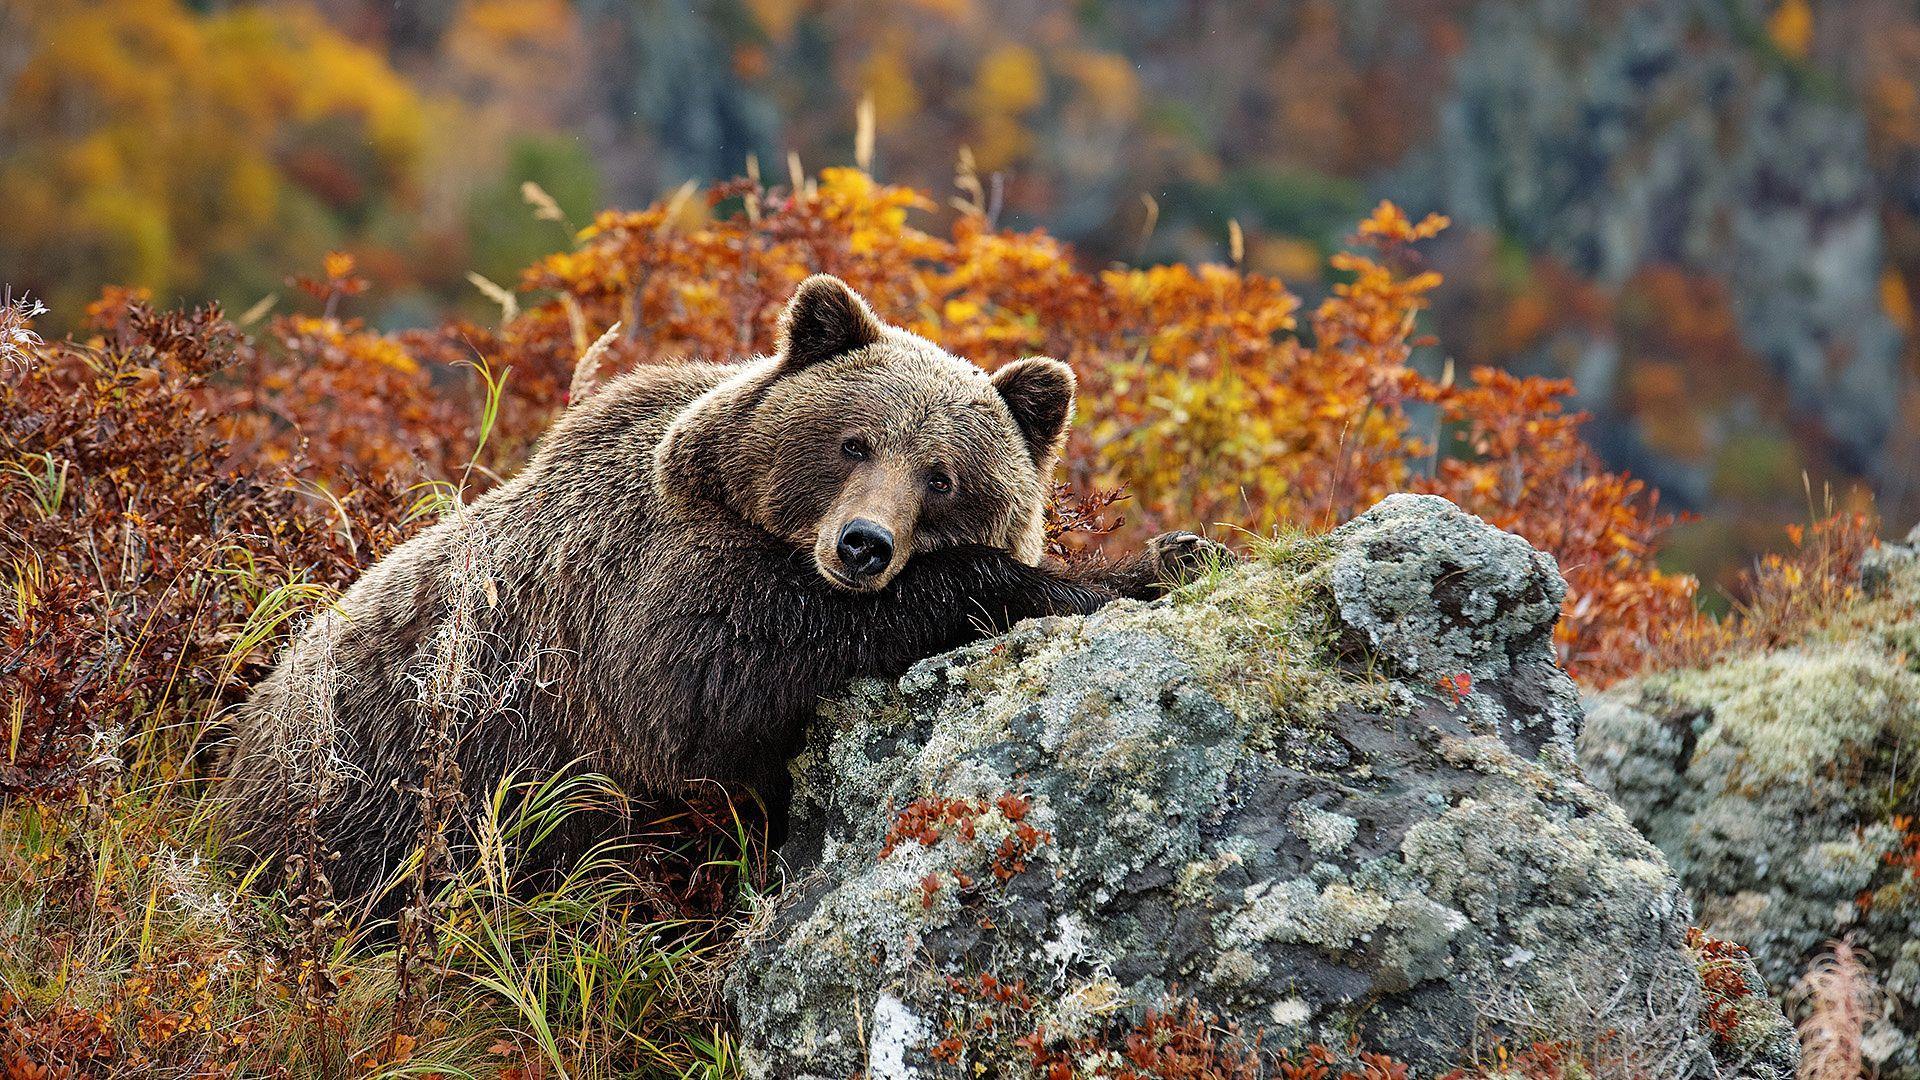 Autumn Bear Wallpapers - Top Free Autumn Bear Backgrounds - WallpaperAccess